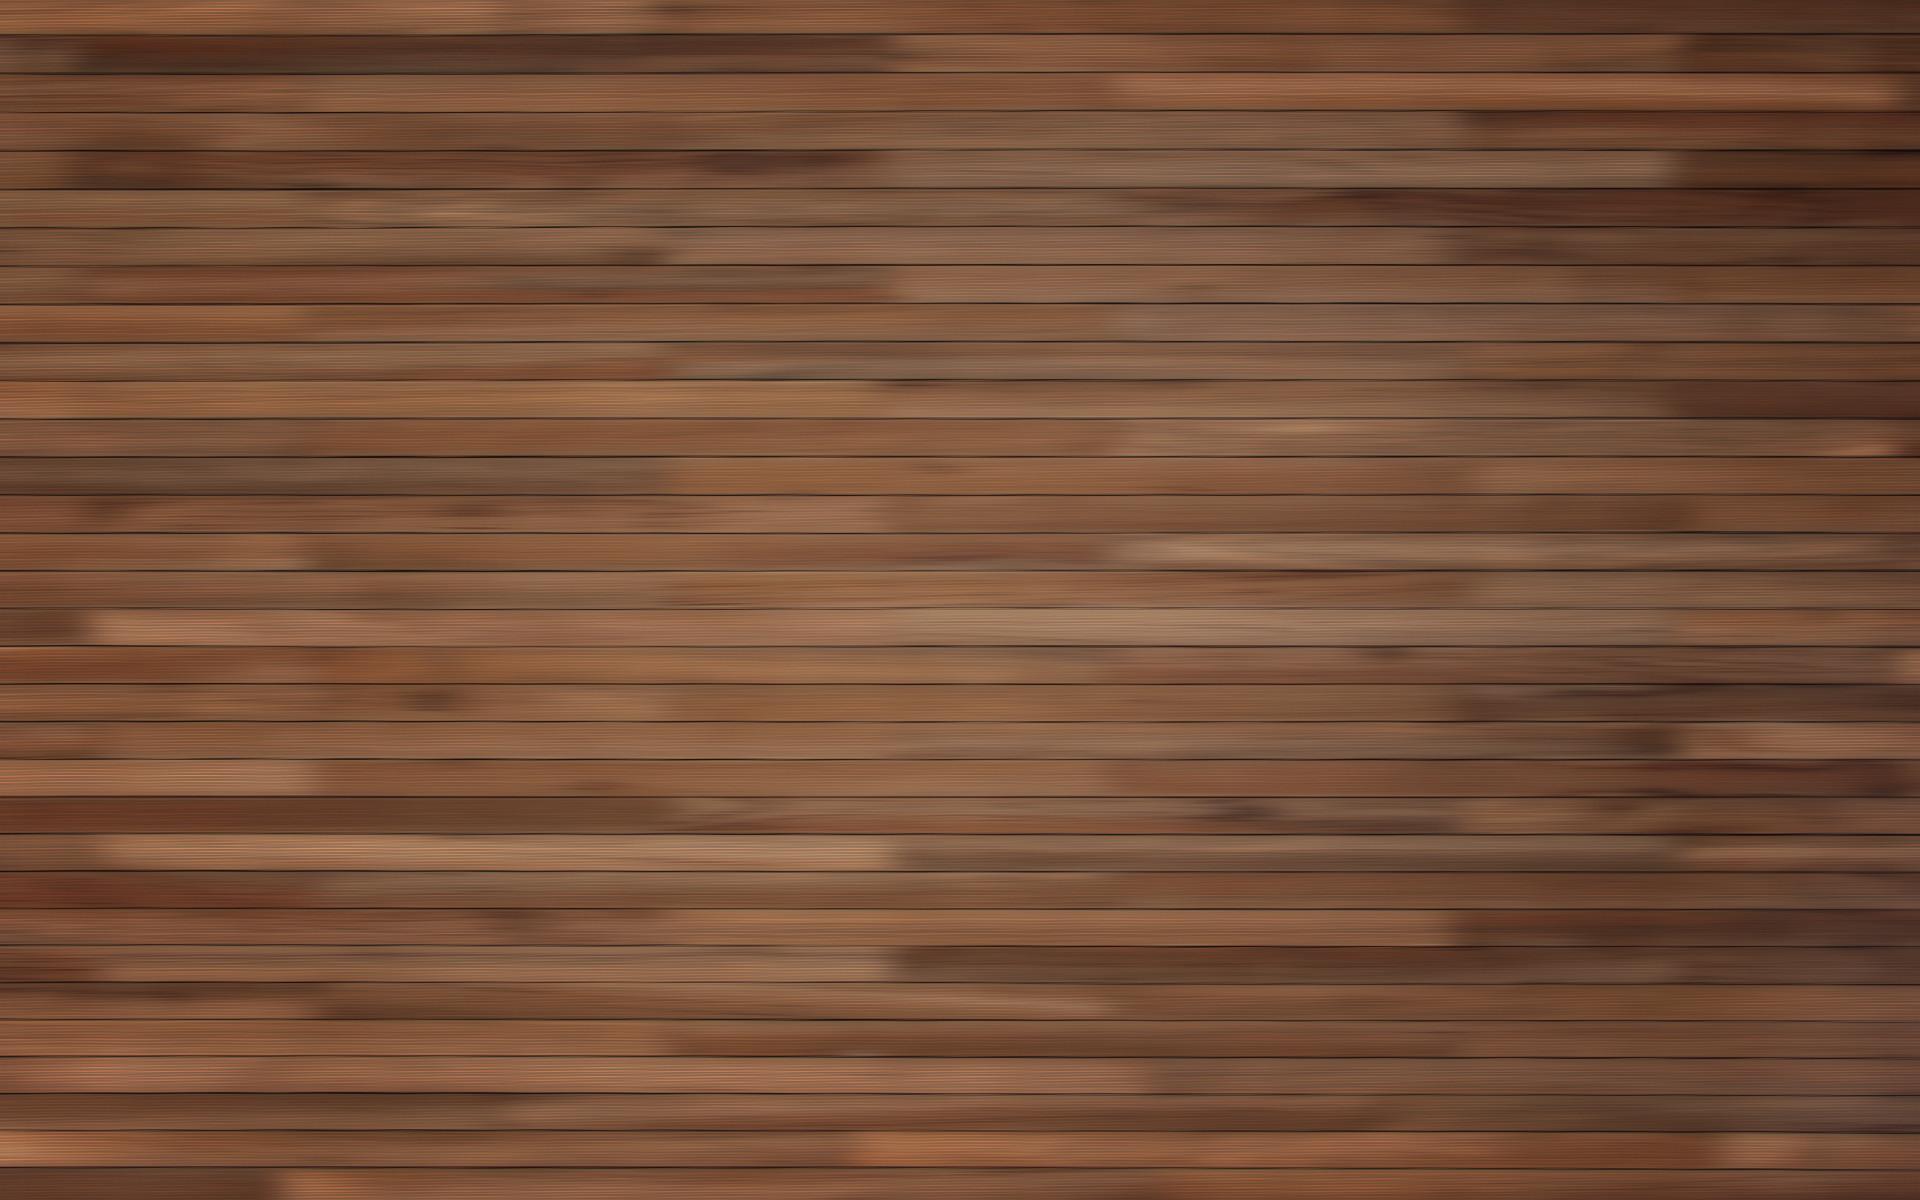 Brown Wood Texture Wallpaper Full Hd